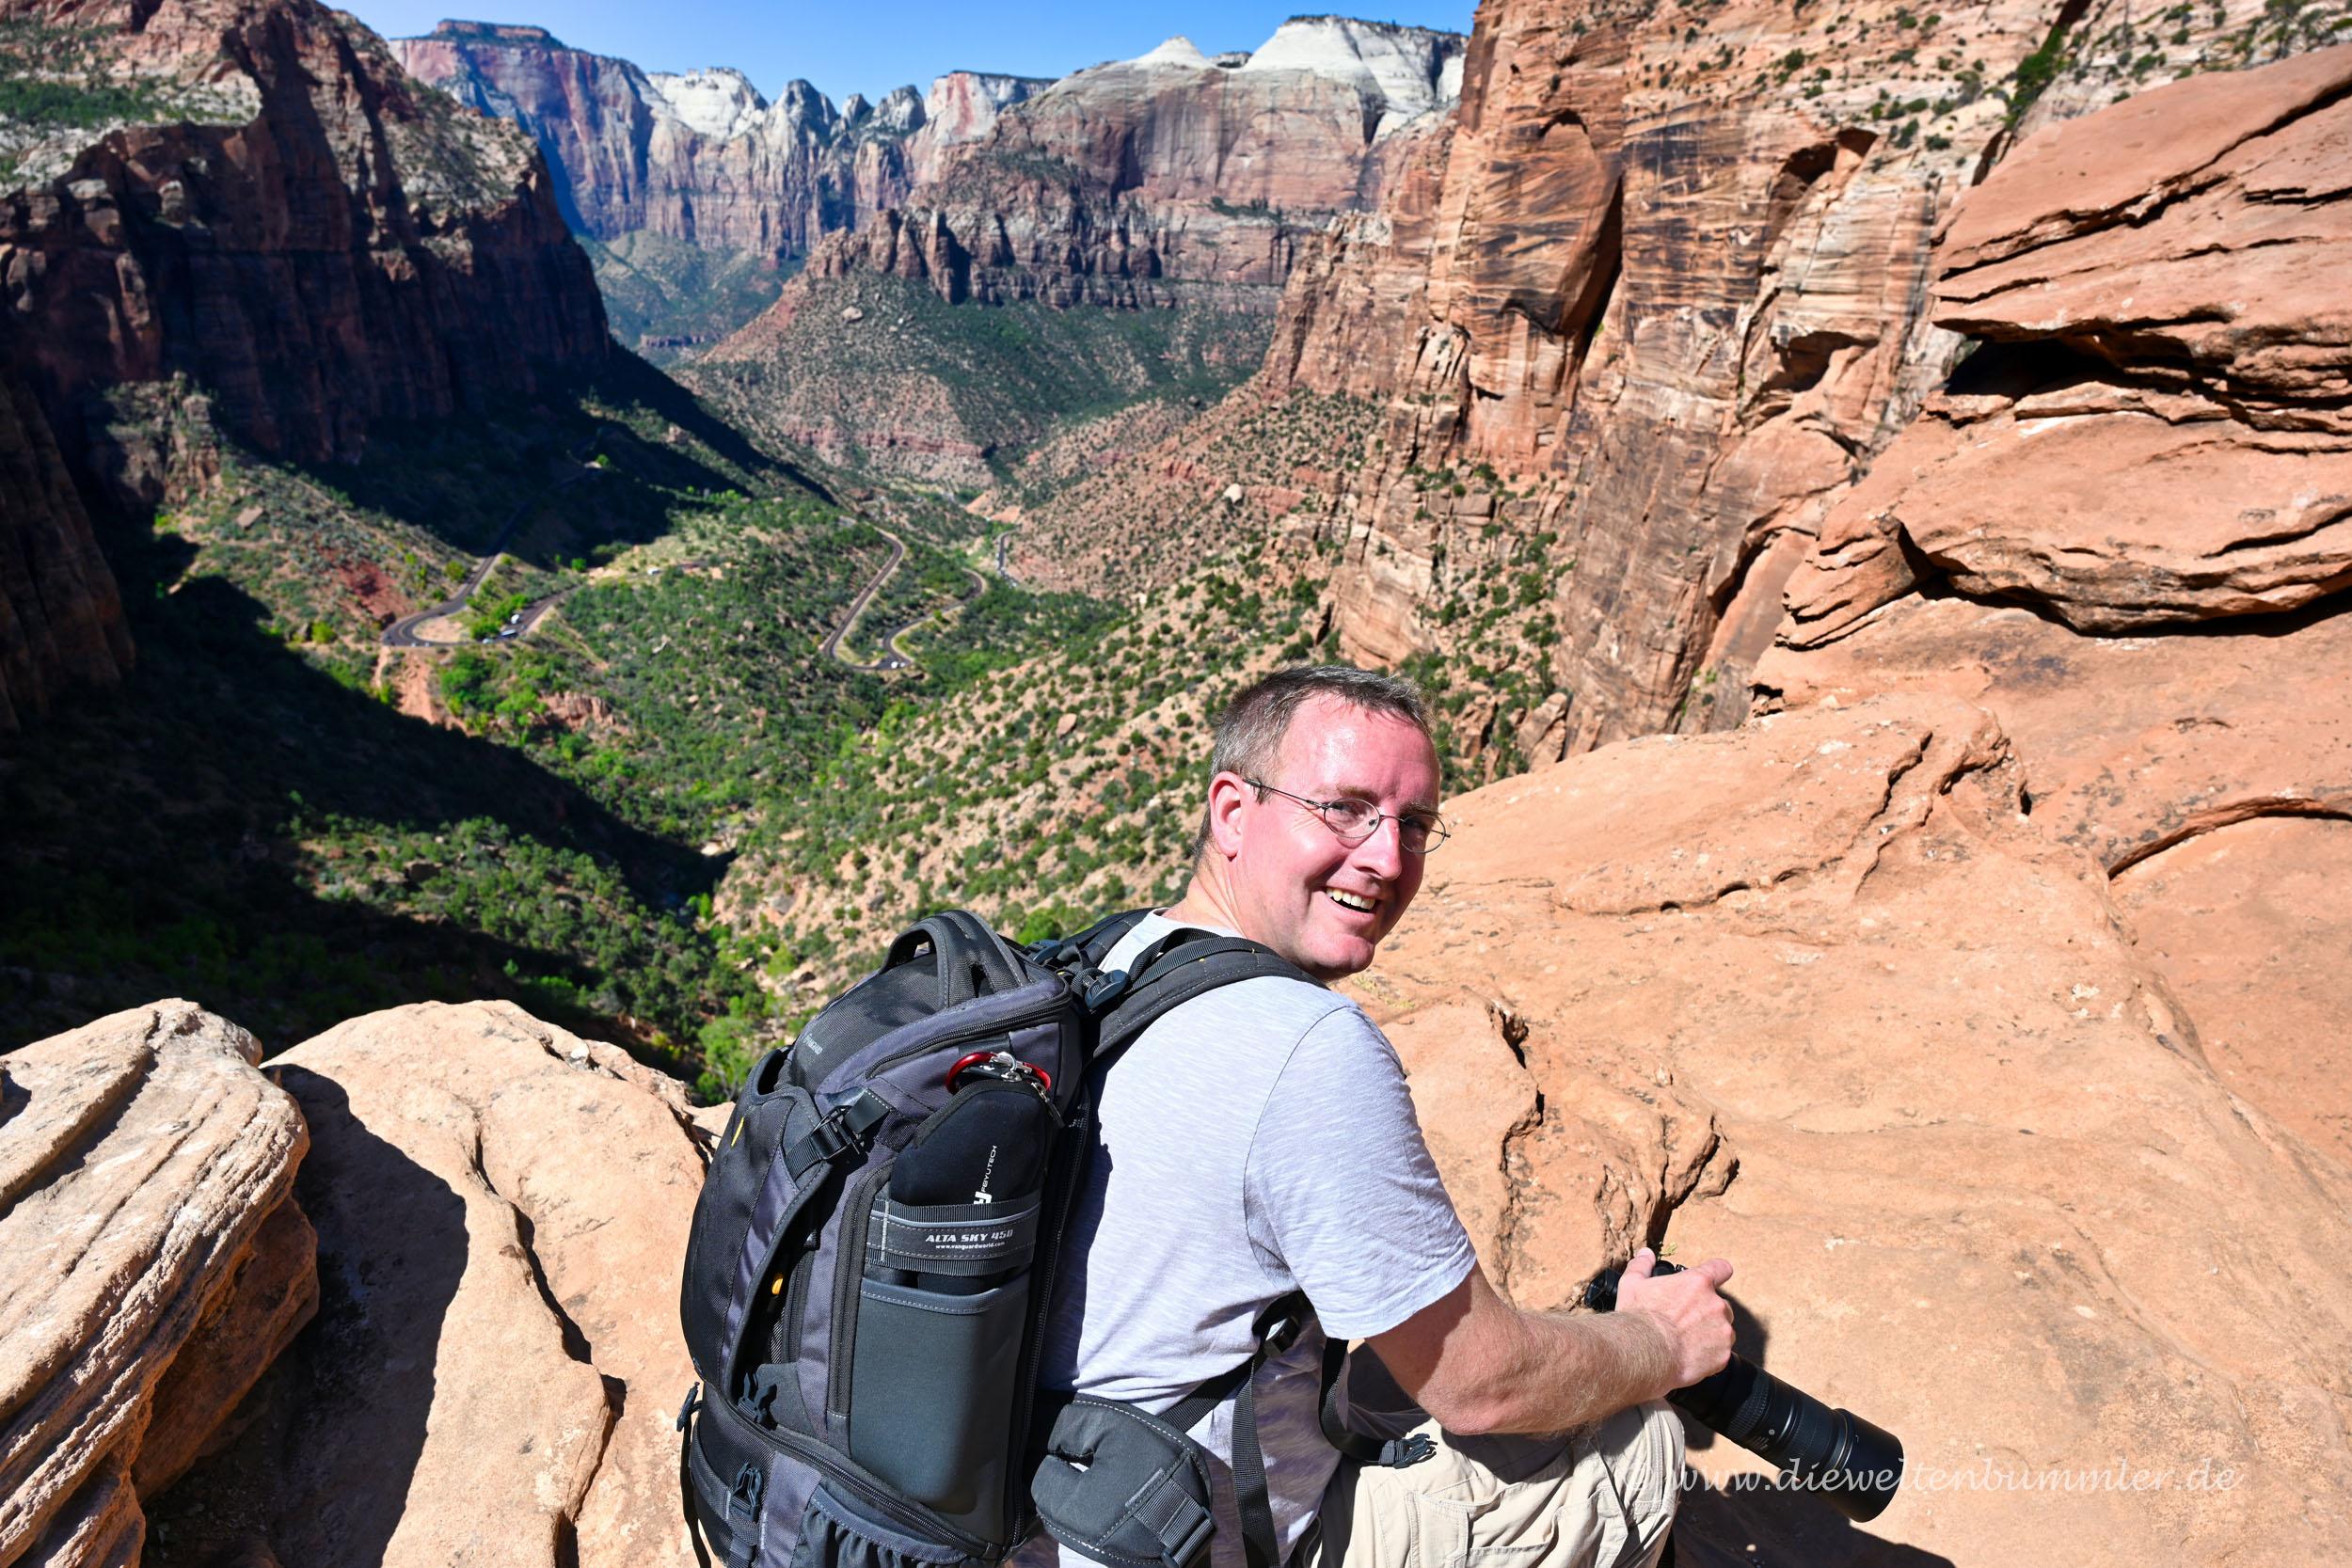 Michael Moll im Zion Nationalpark